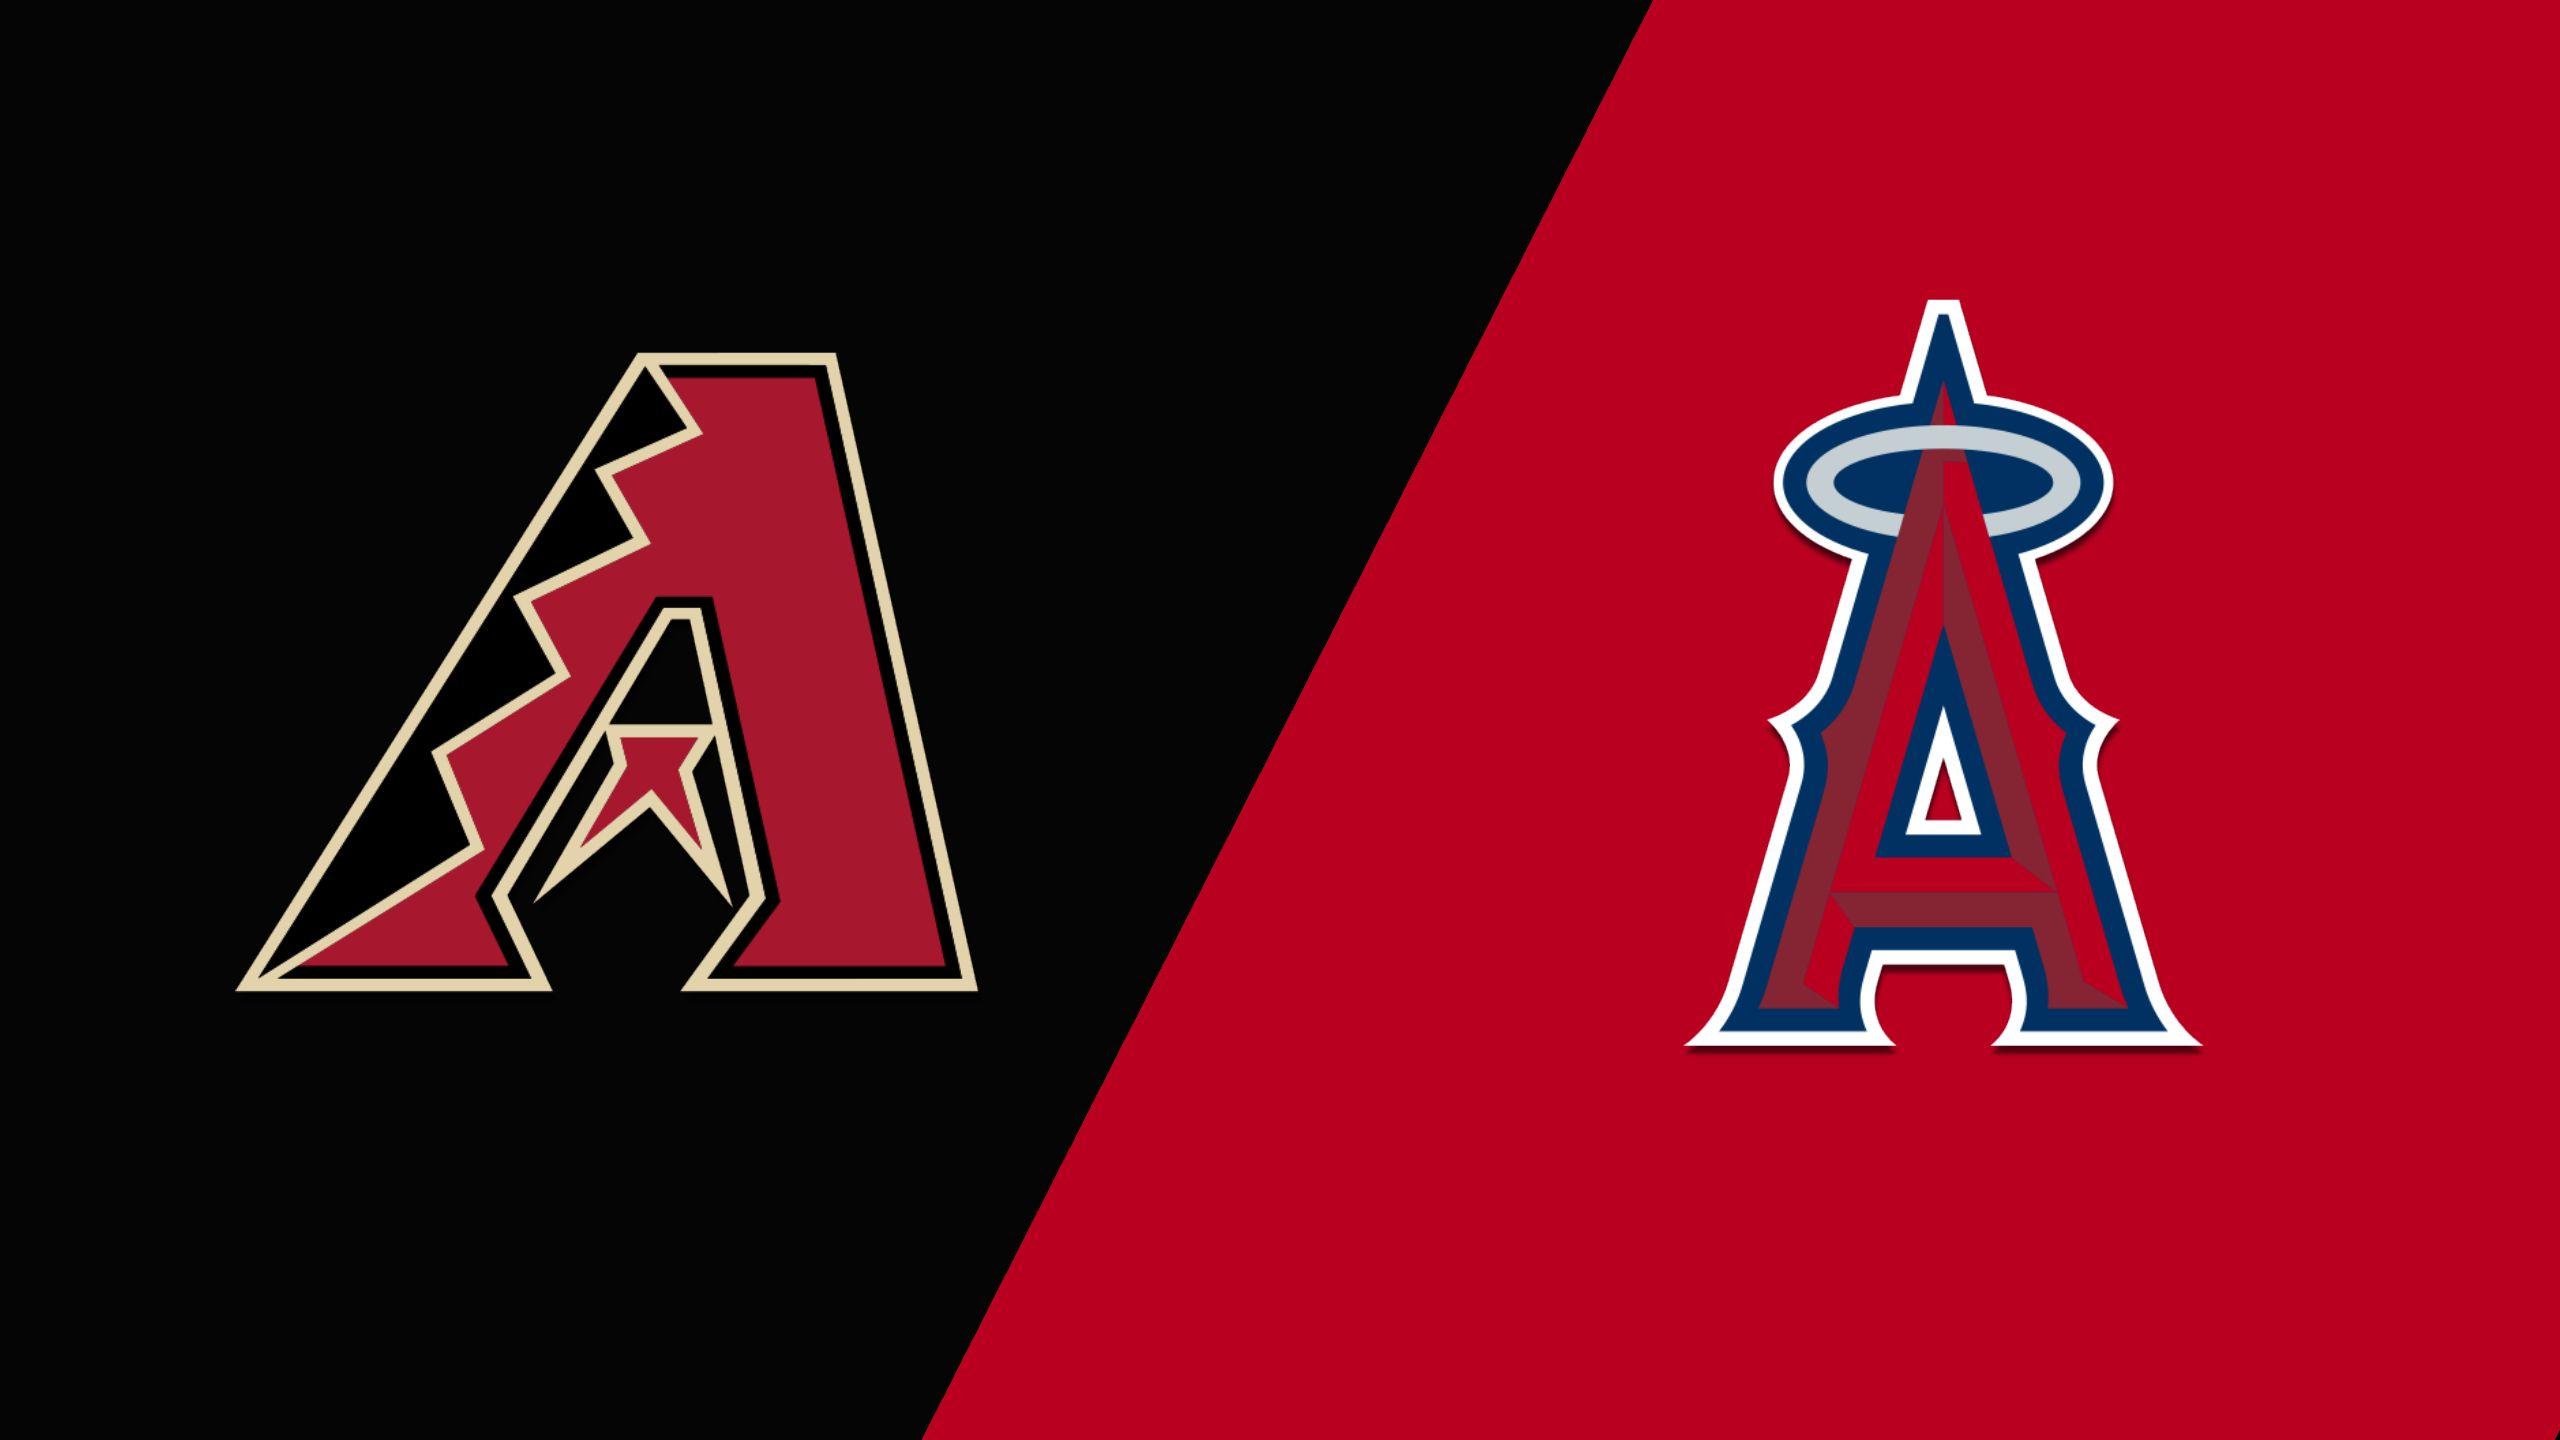 In Spanish - Arizona Diamondbacks vs. Los Angeles Angels of Anaheim